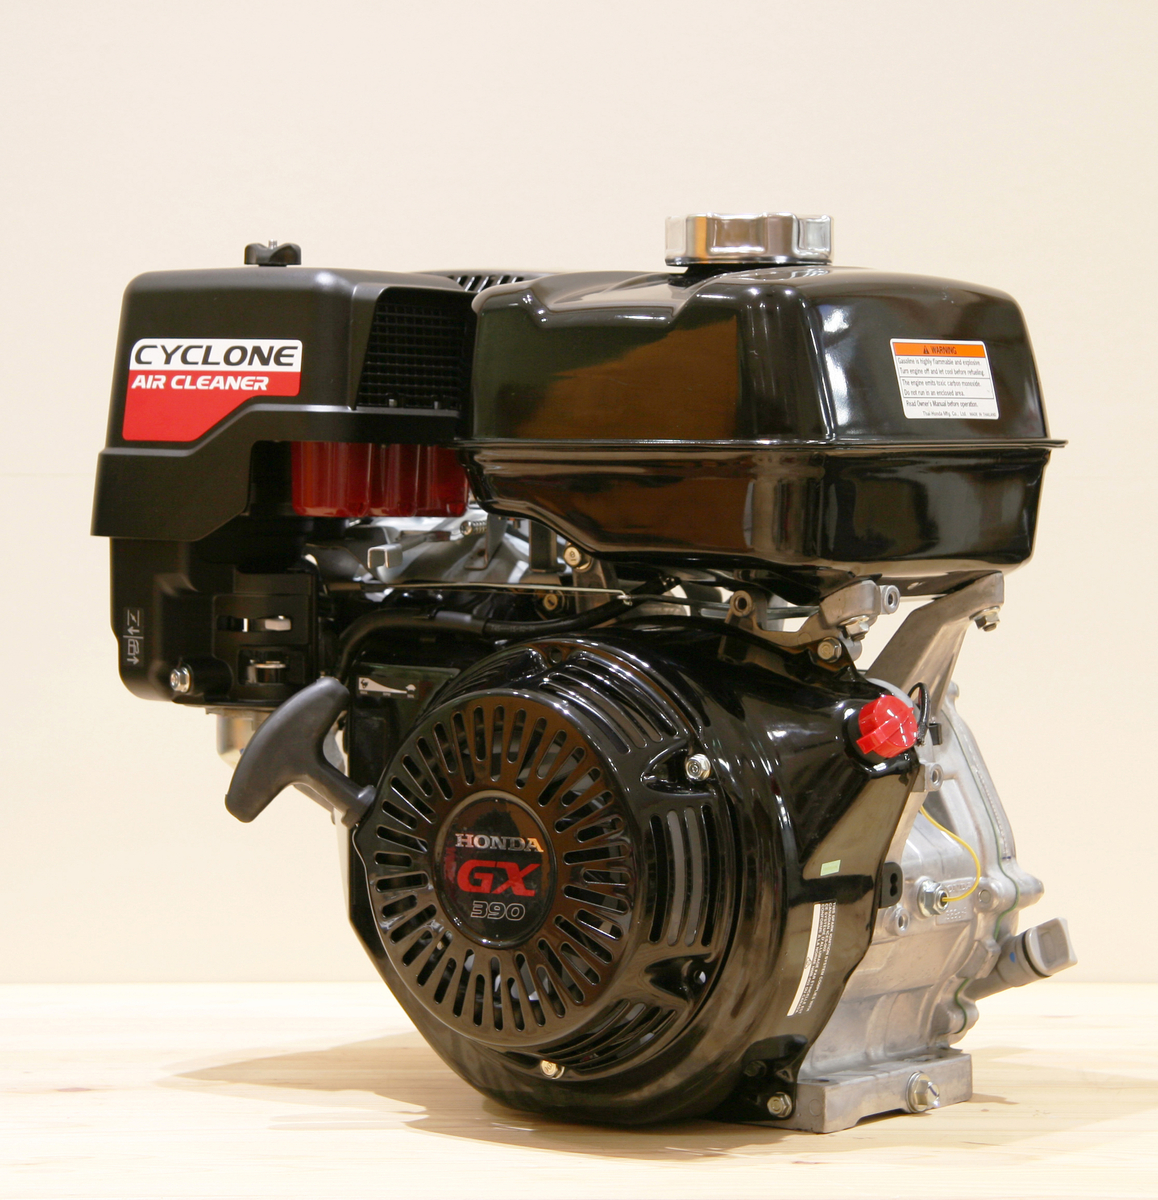 Engine Air Cleaner 15 : Honda engines develops cyclone air cleaner the news wheel